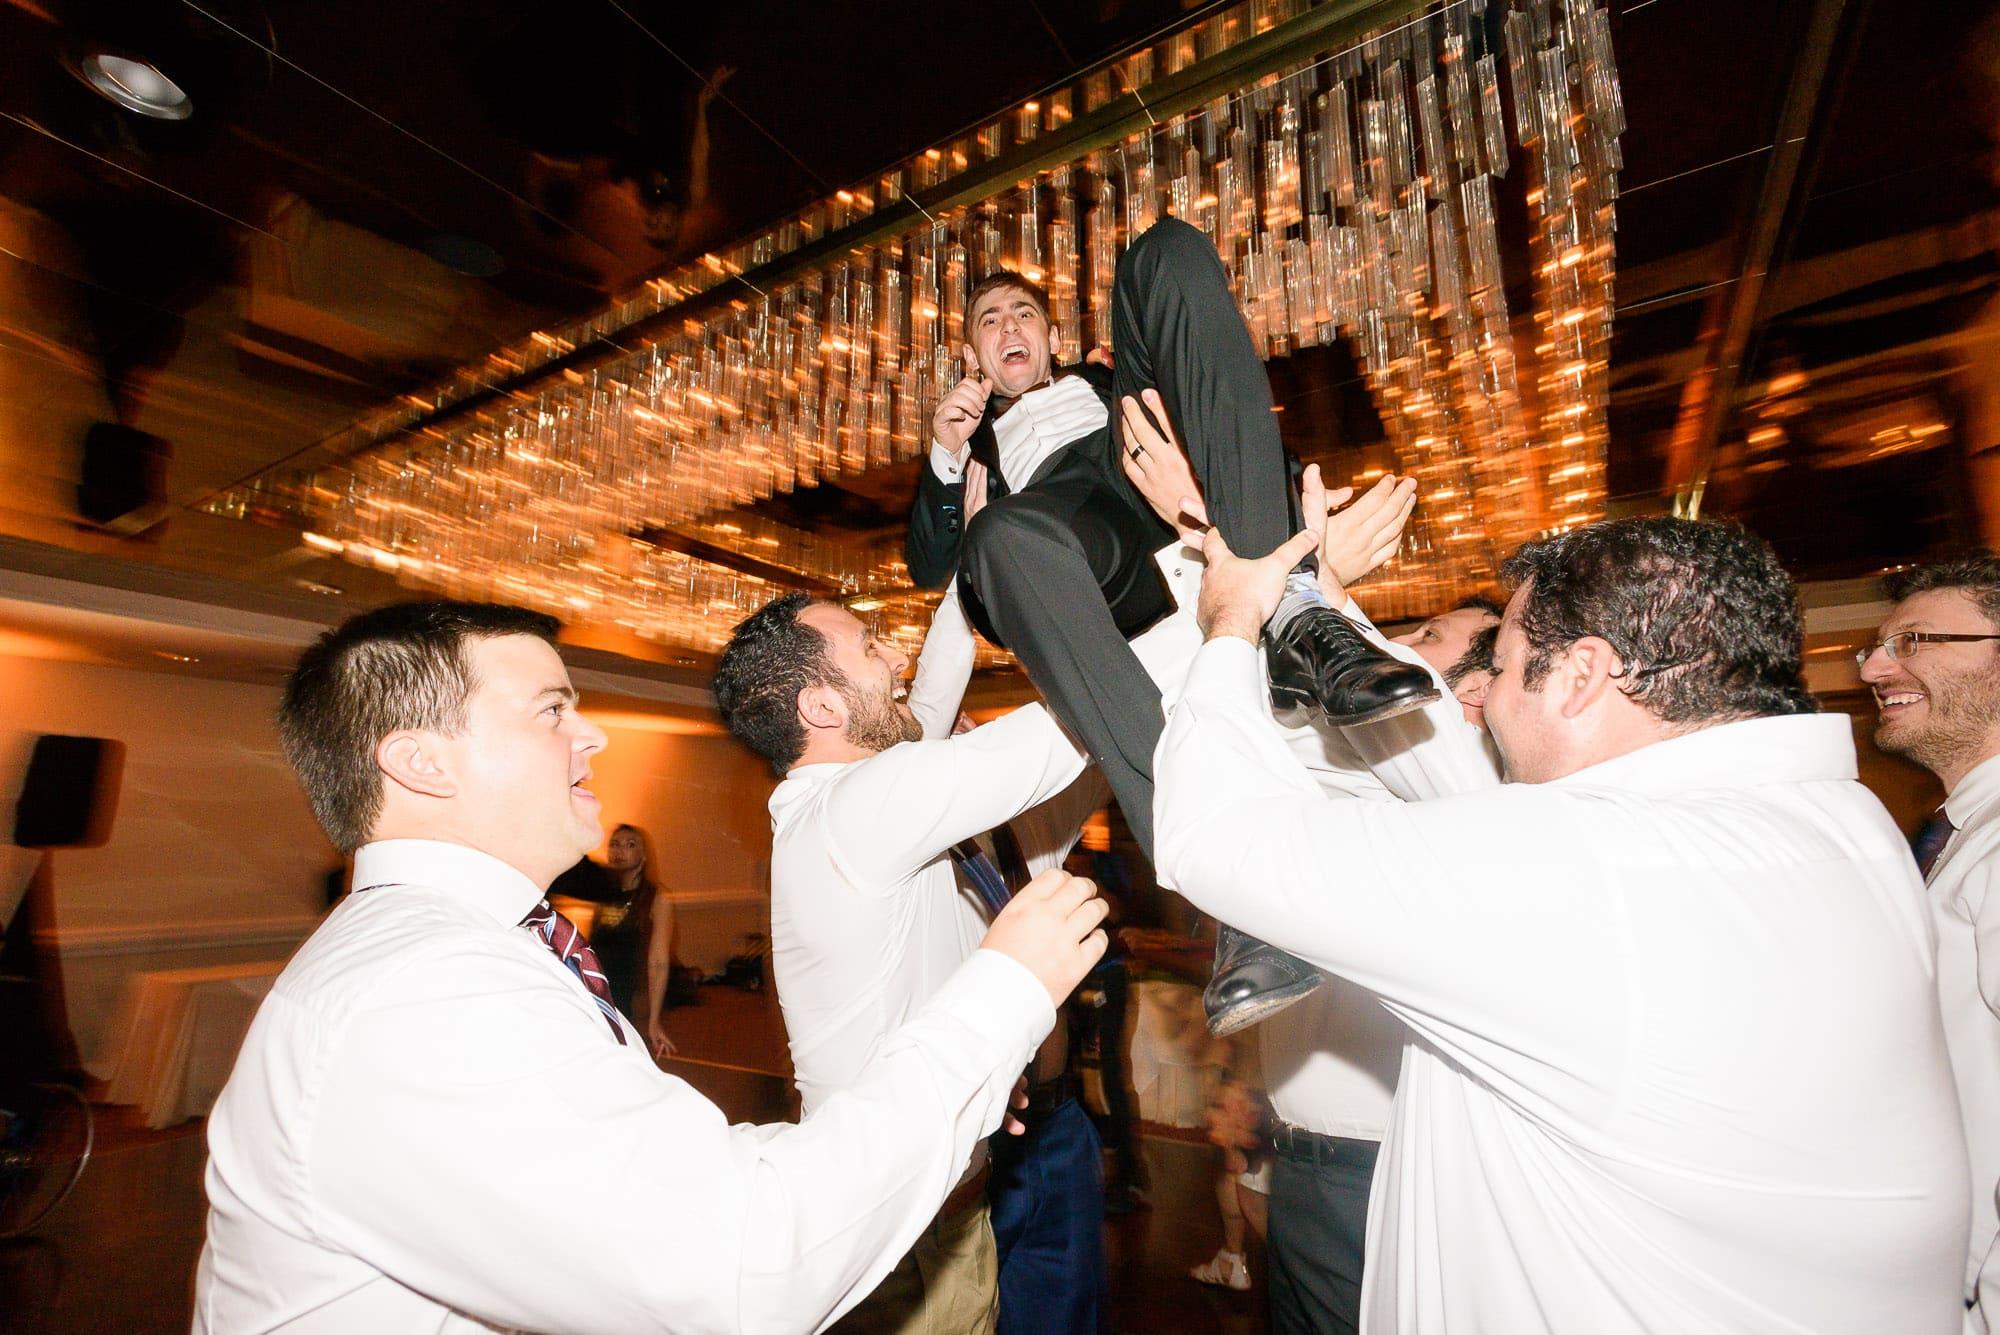 077_Alan_and_Heidi_Los_Angeles_Equestrian_Center_Wedding